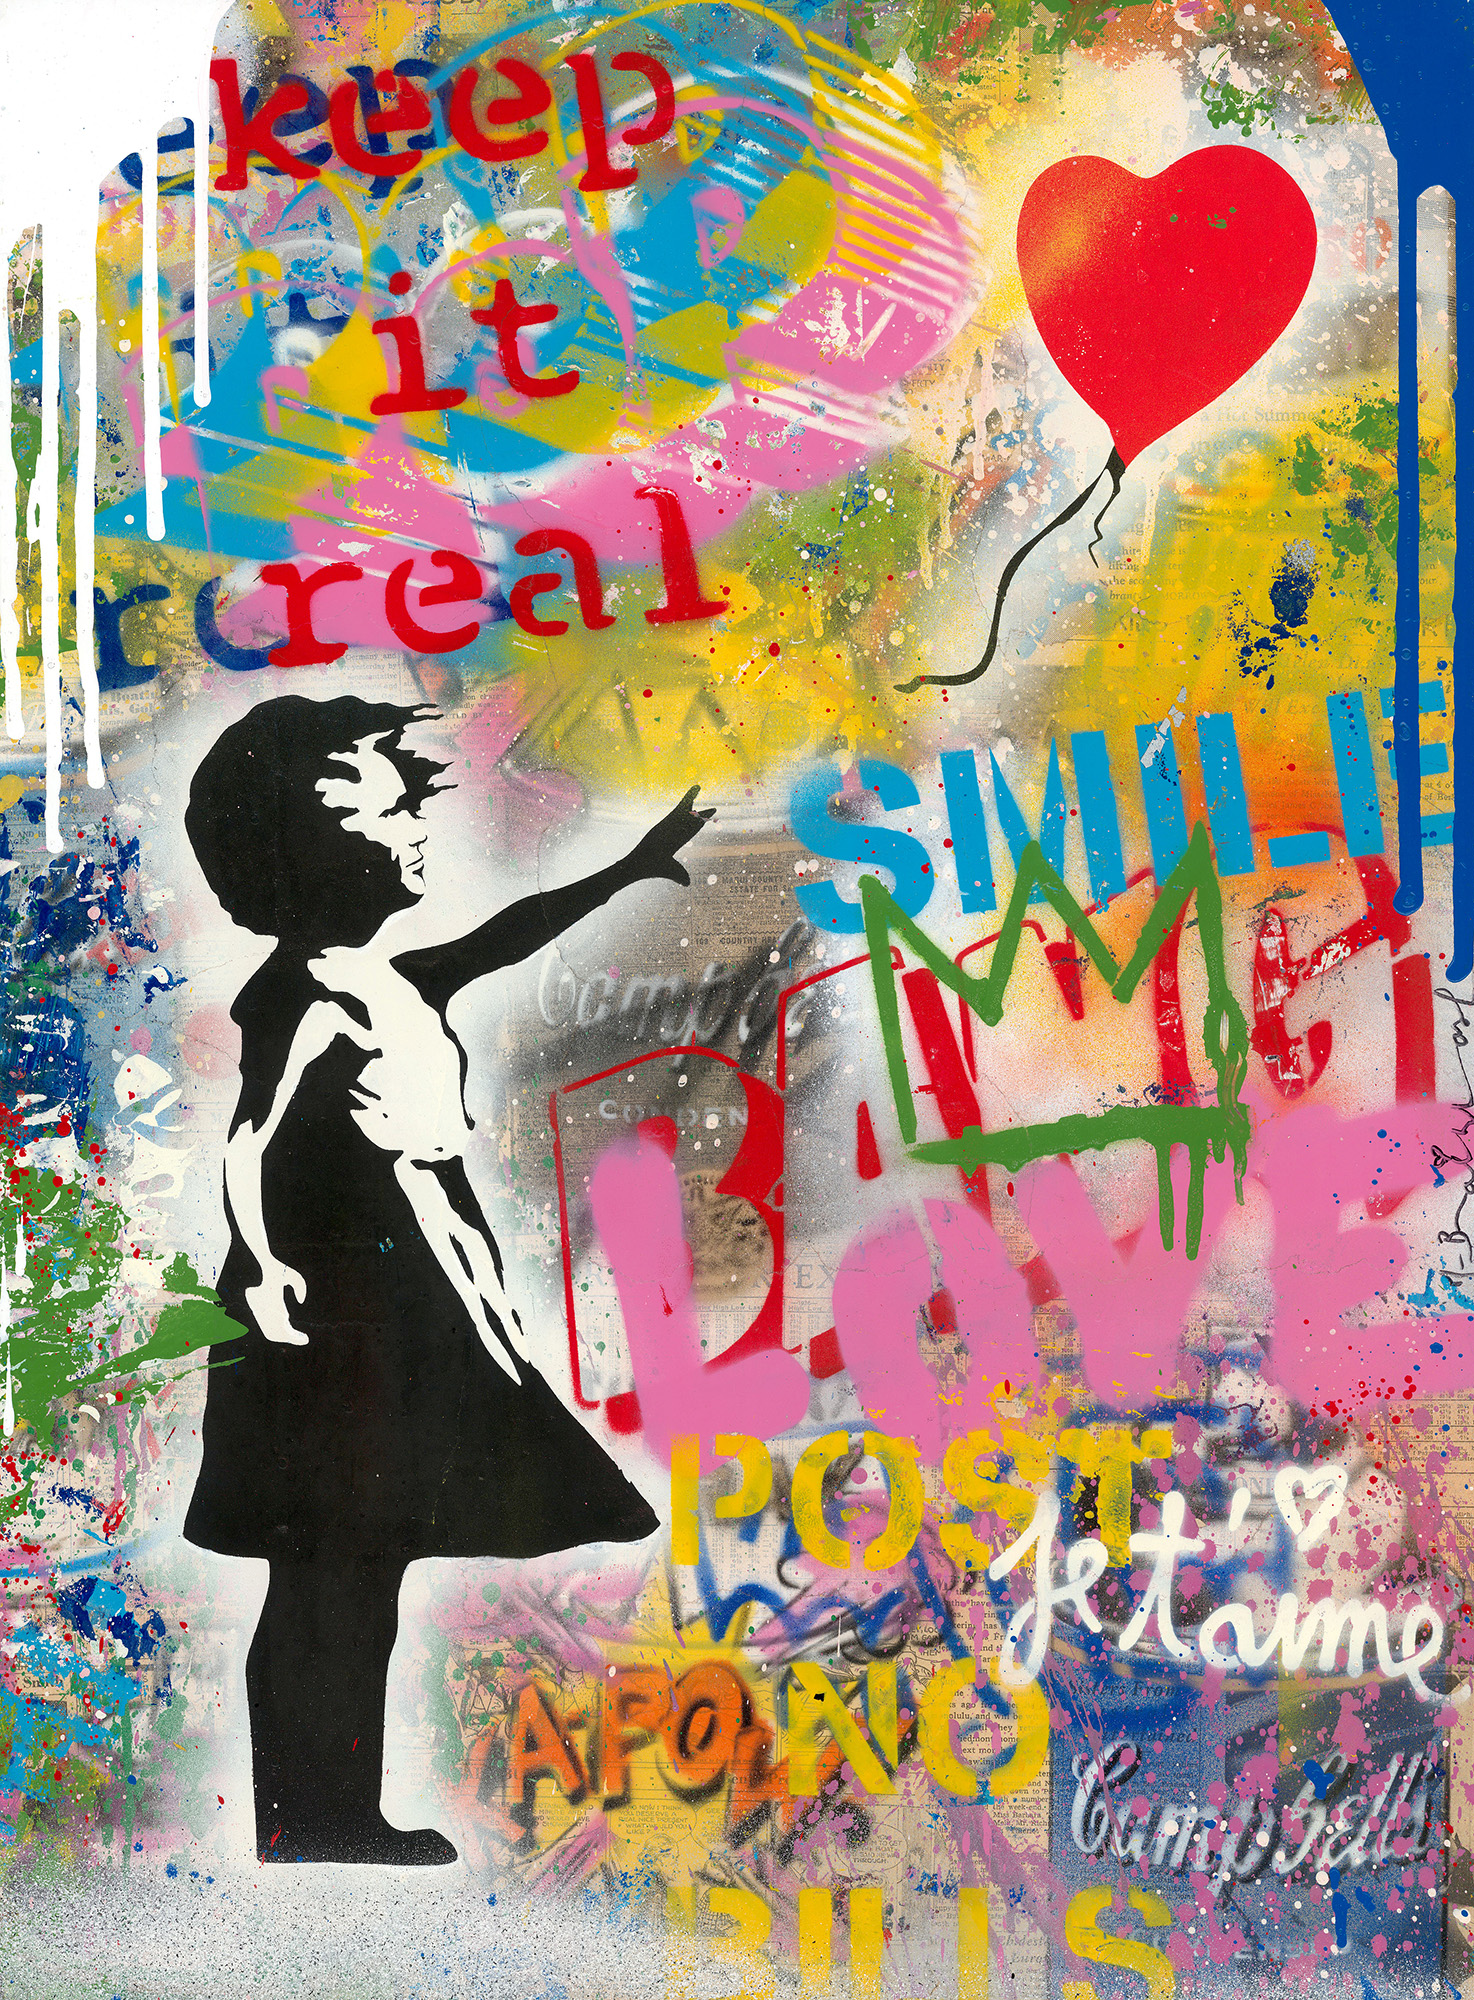 Mr. Brainwash - Balloon Girl , 9003-012-106